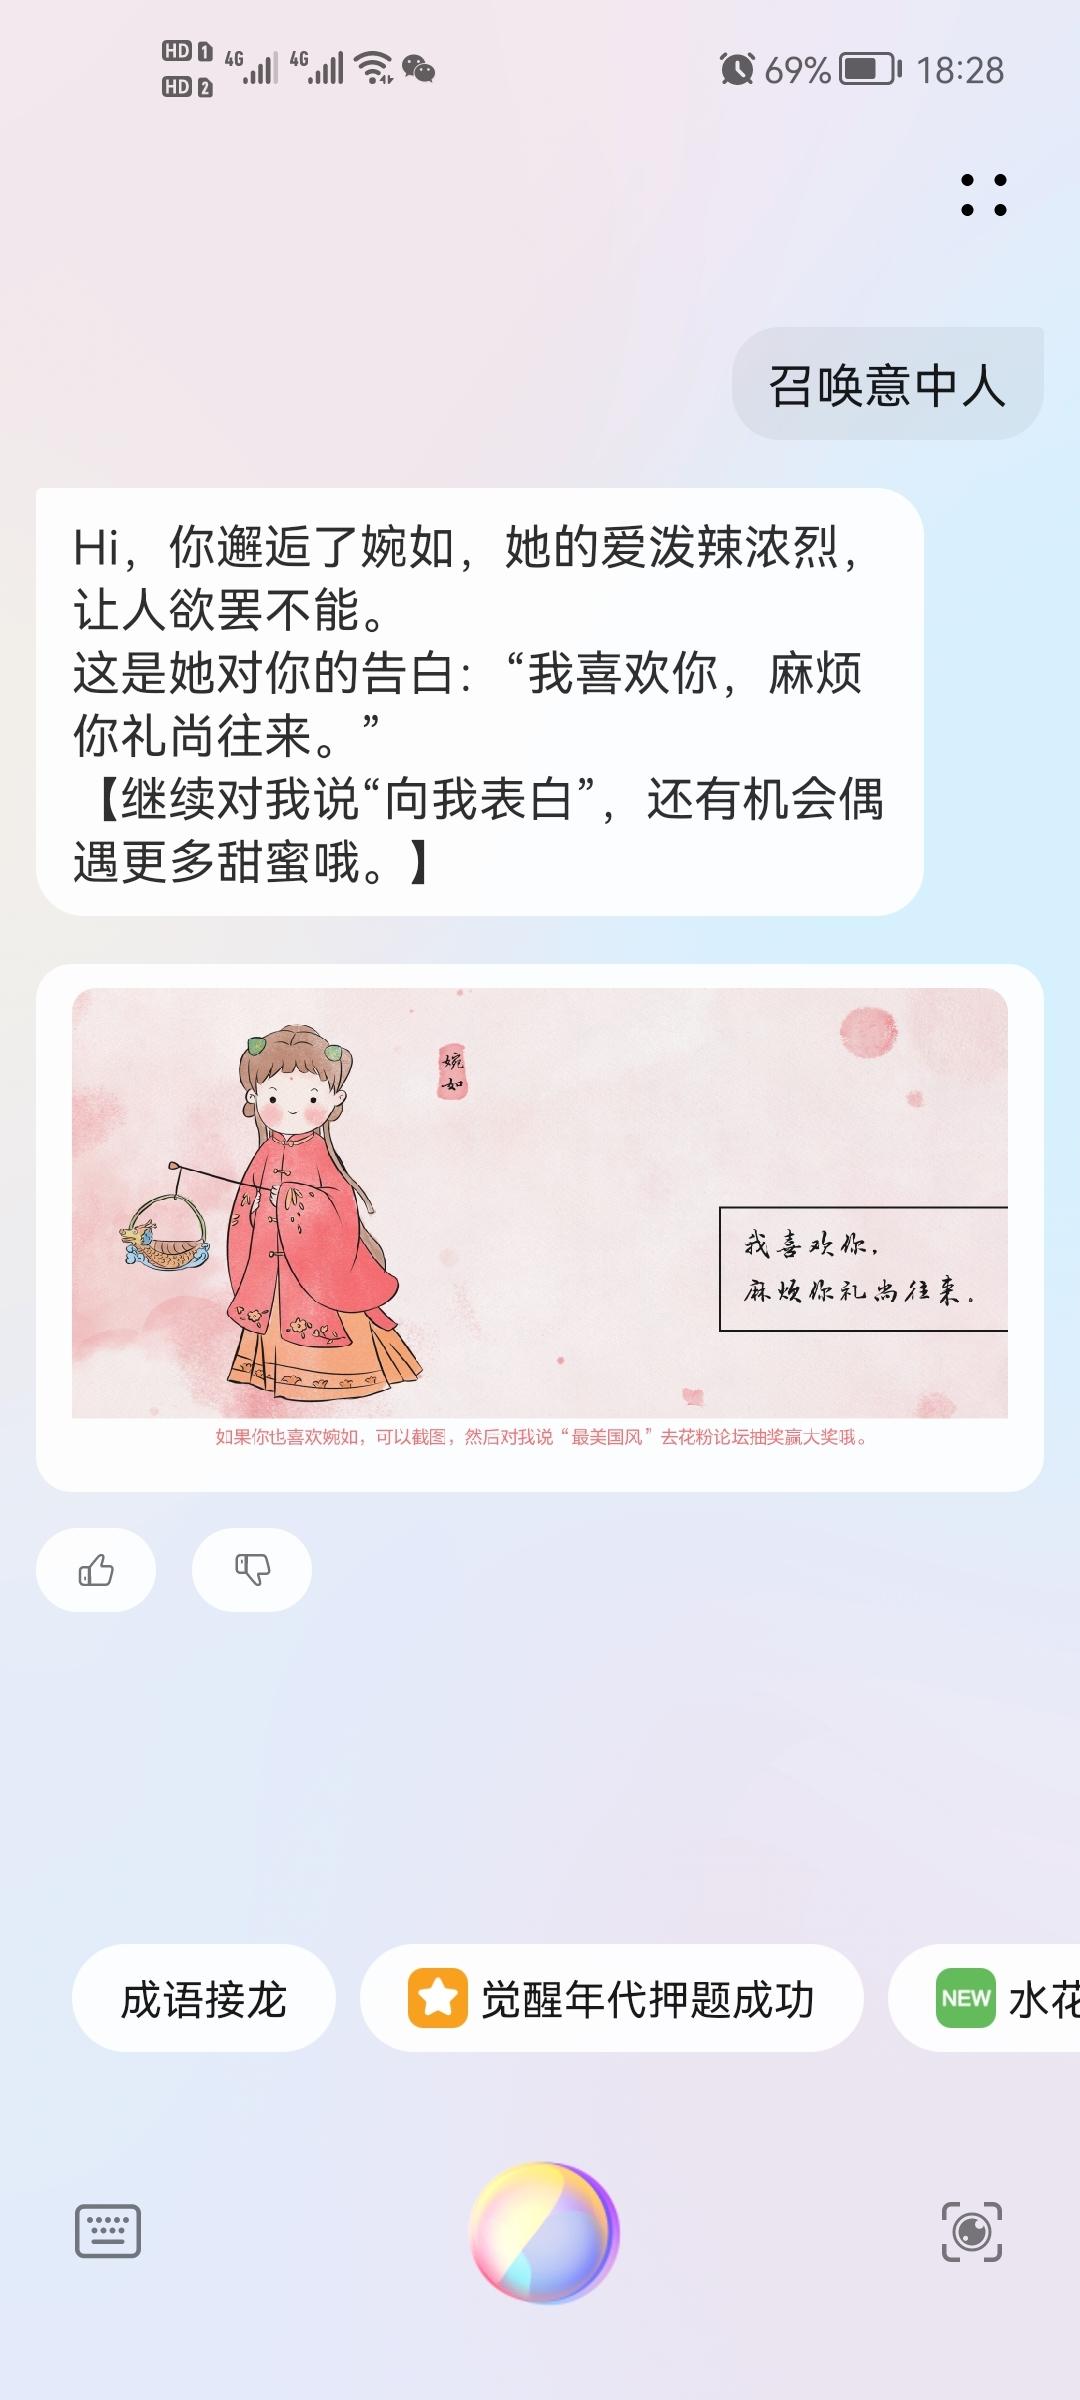 Screenshot_20210611_182812_com.huawei.vassistant.jpg